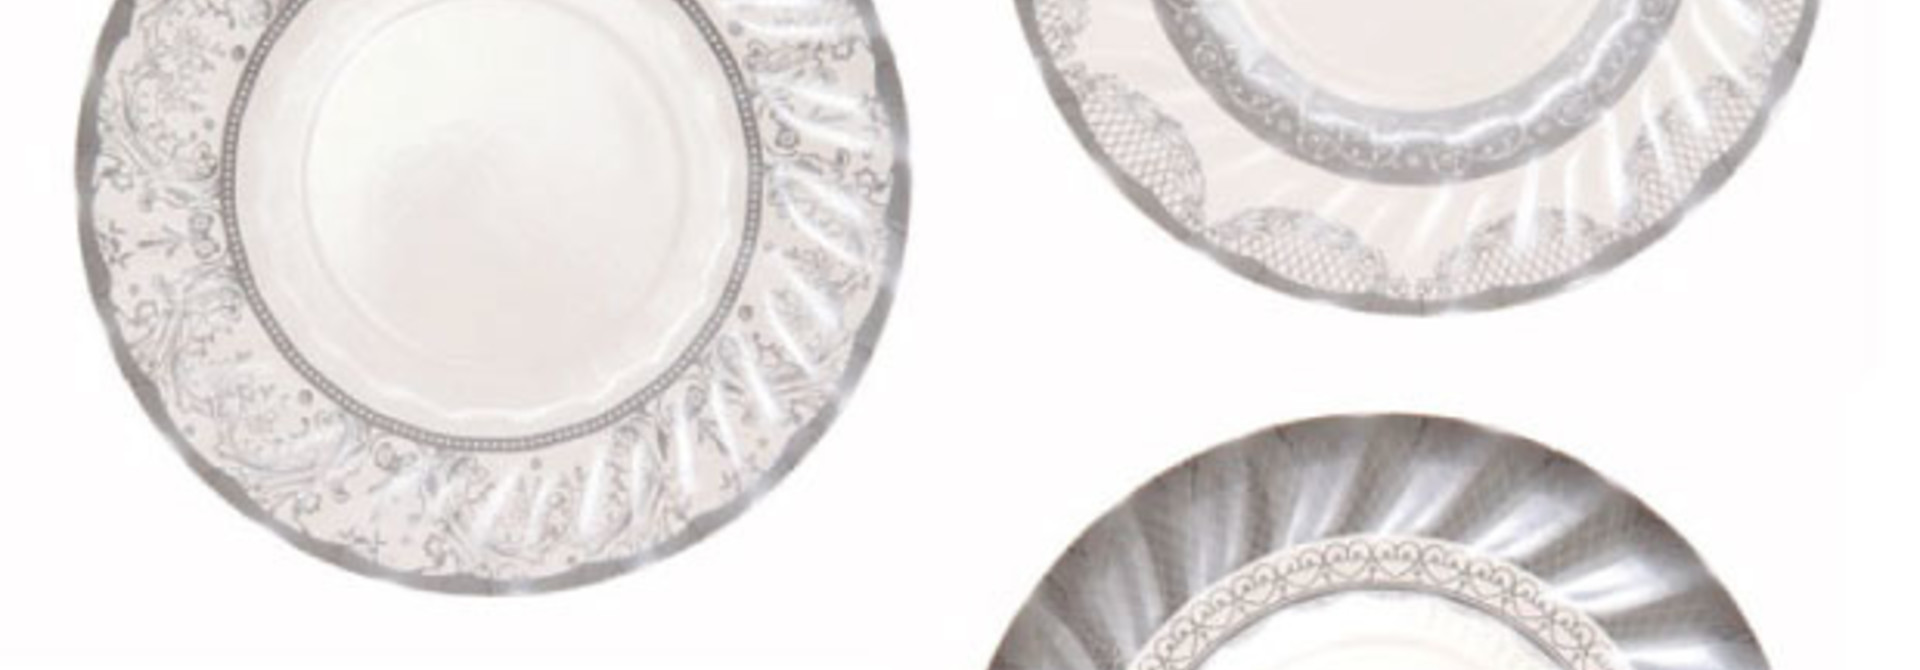 Gebaksbordjes party porcelain zilver (12 st) - Talking Tables